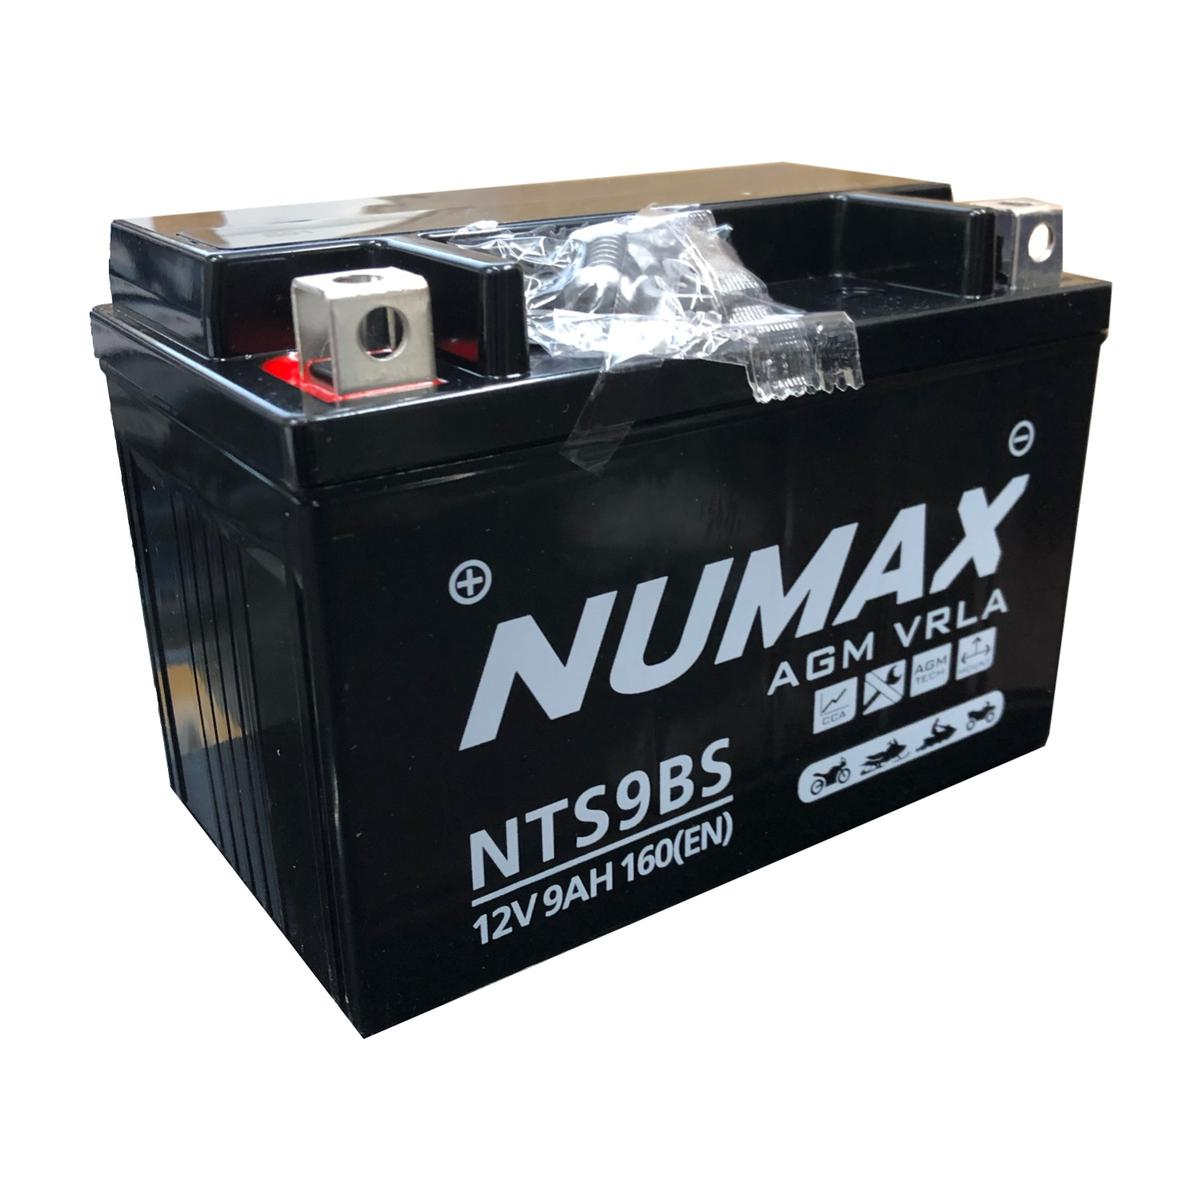 Numax NTS9BS 12v Motorbike Bike Battery KTM 650 650cc LS-E YXT9-4